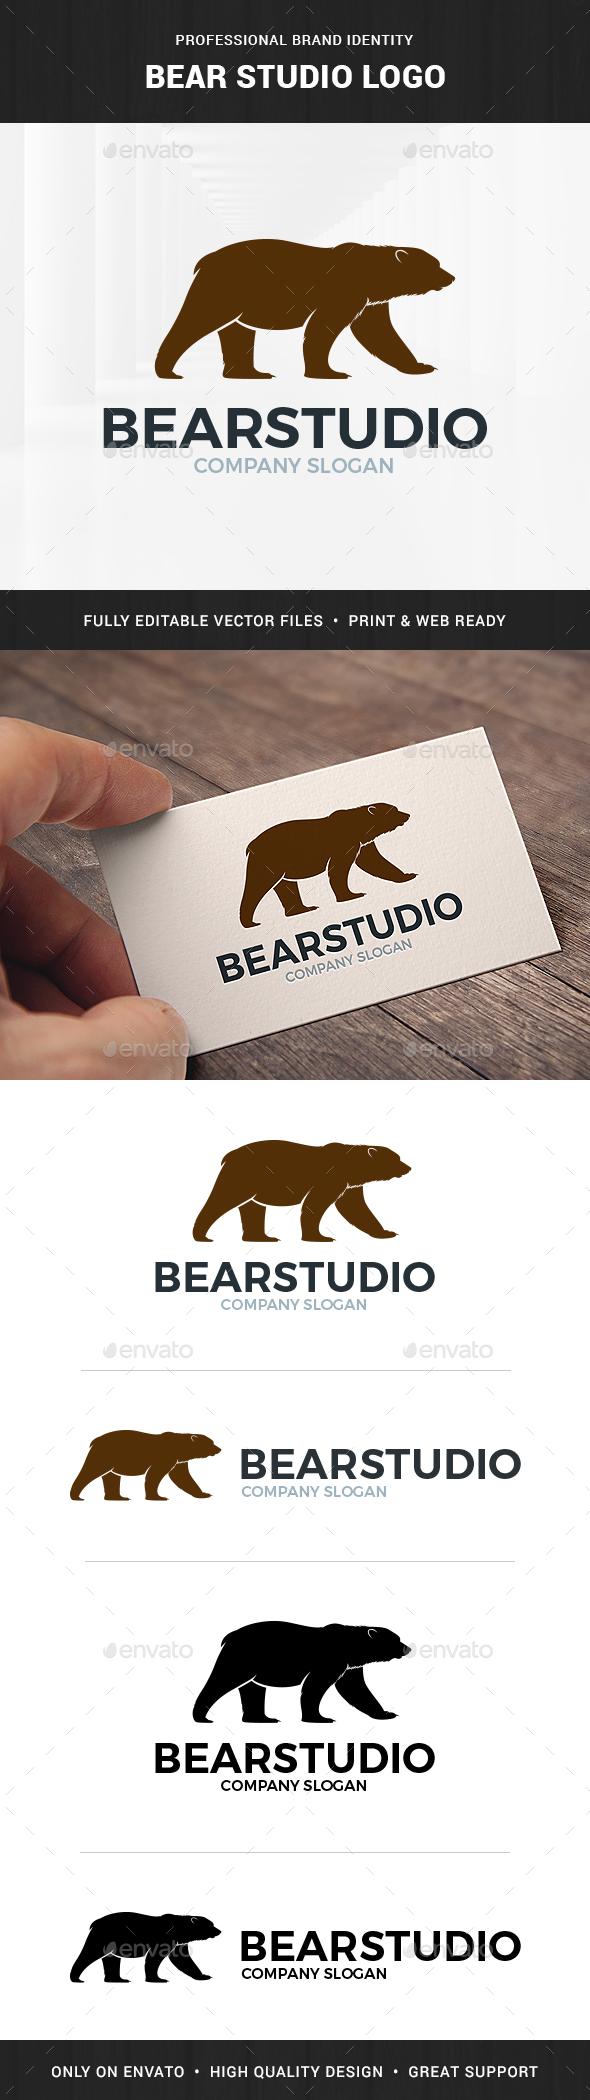 Bear Studio Logo Template